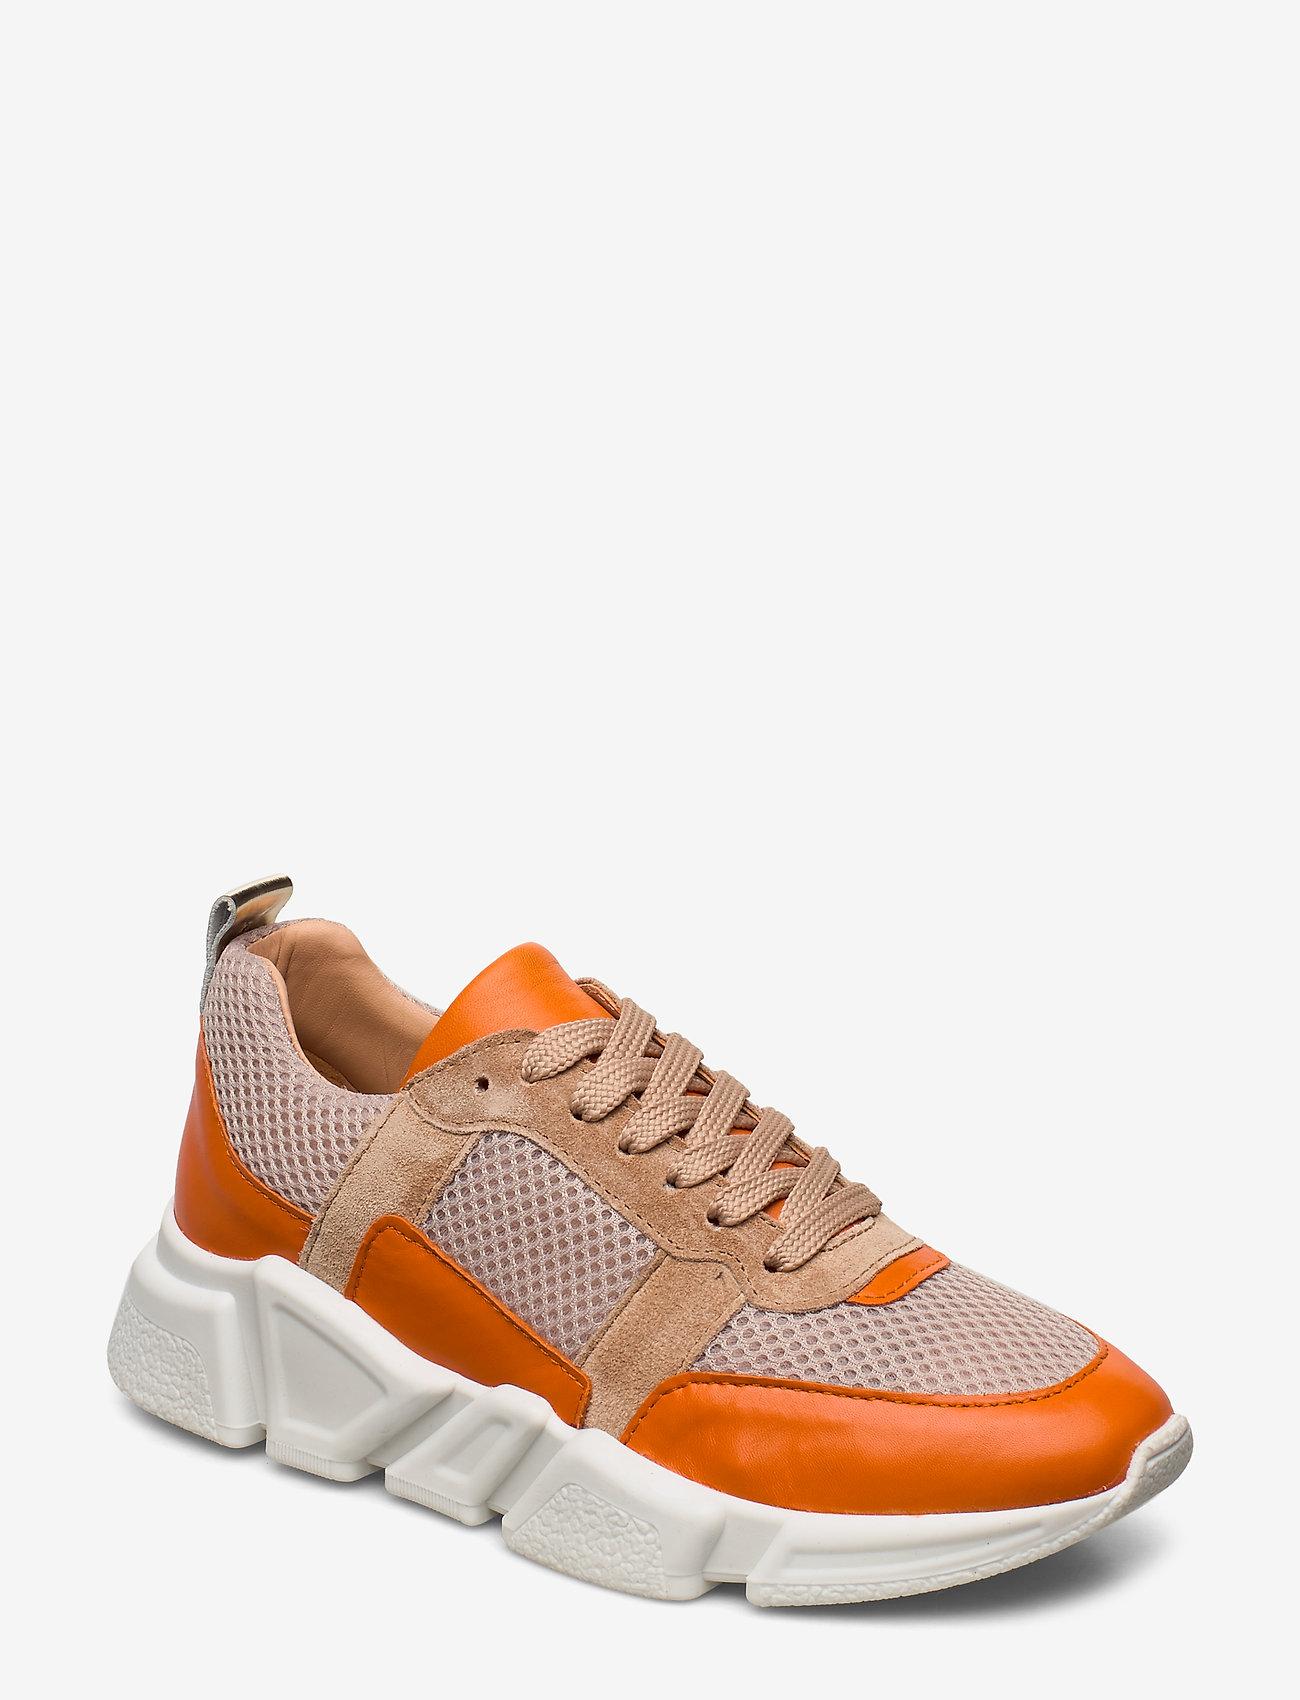 Billi Bi - SHOES 8853 - chunky sneakers - orange/beige comb. - 0